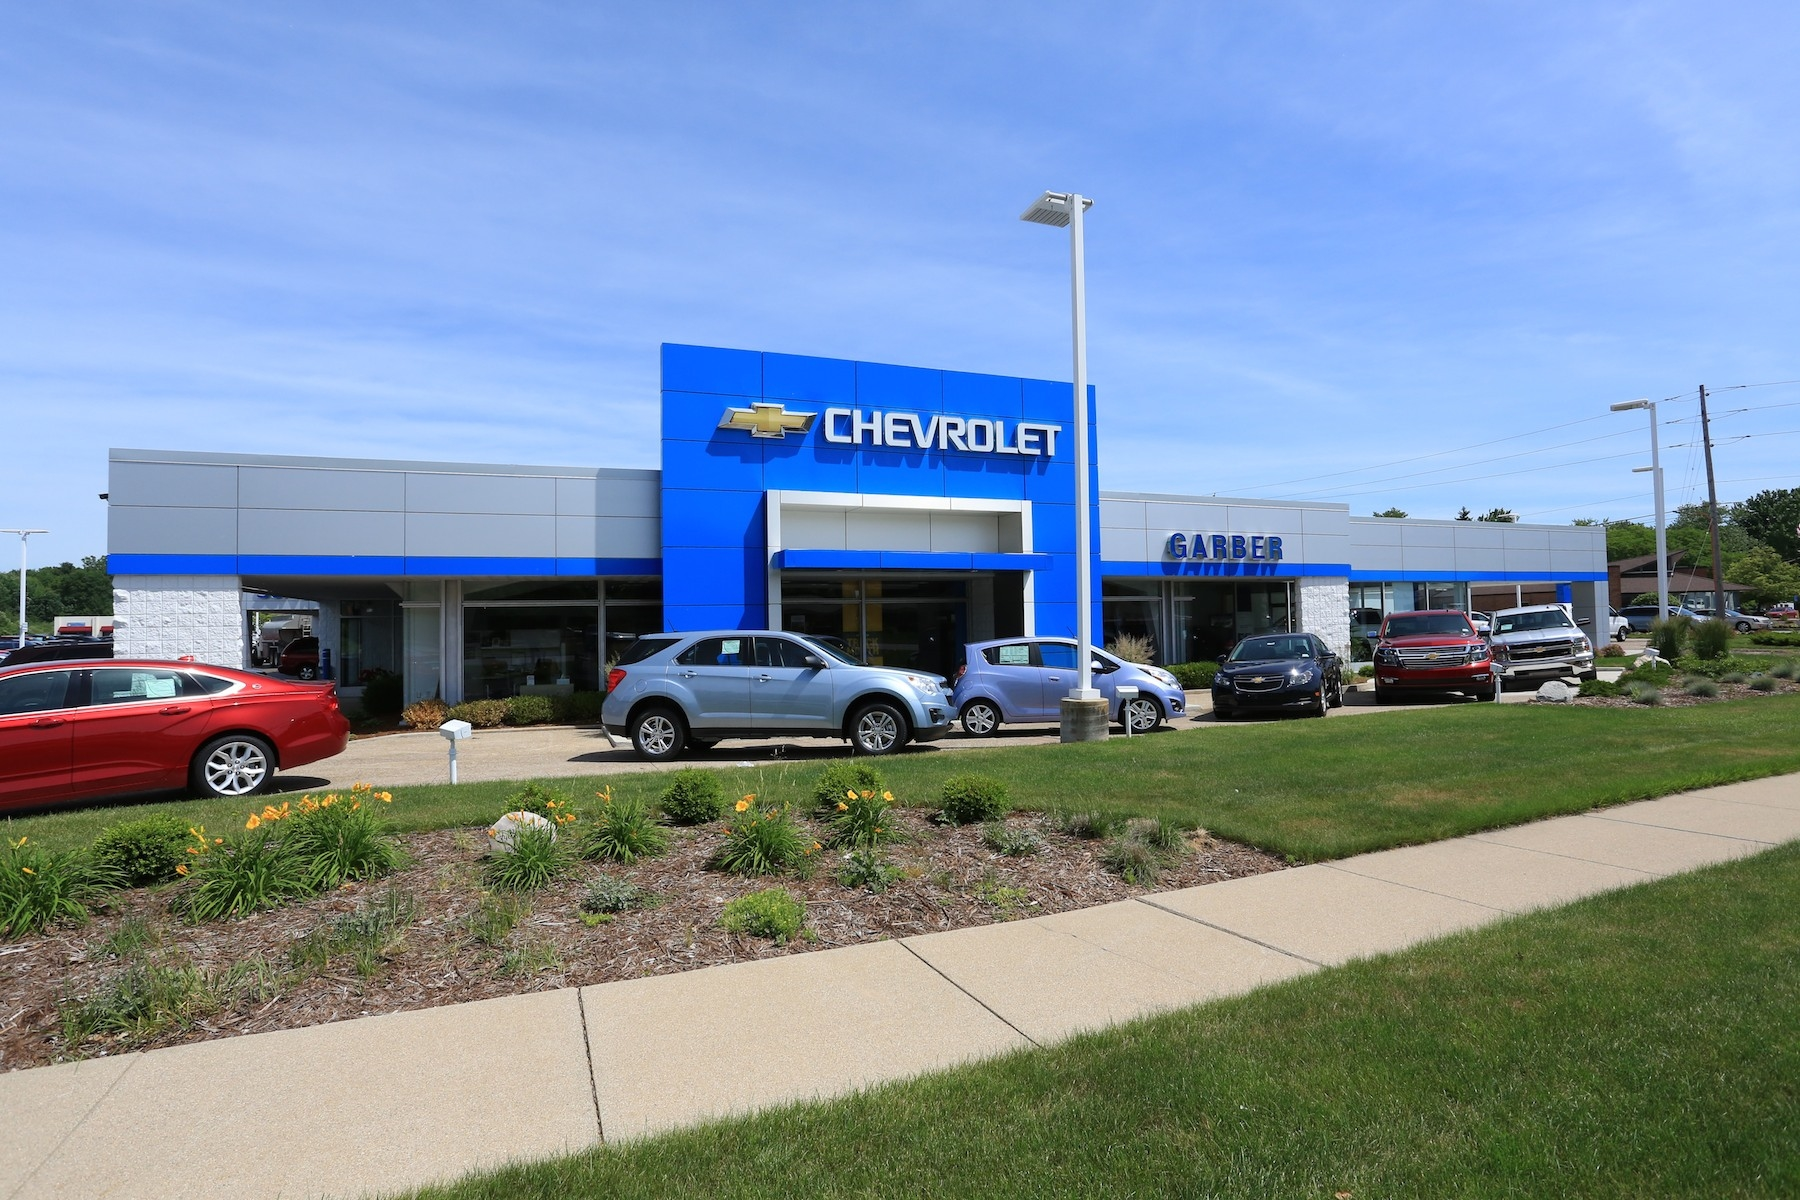 new cars trucks suvs for sale in garber chrysler autos post. Black Bedroom Furniture Sets. Home Design Ideas